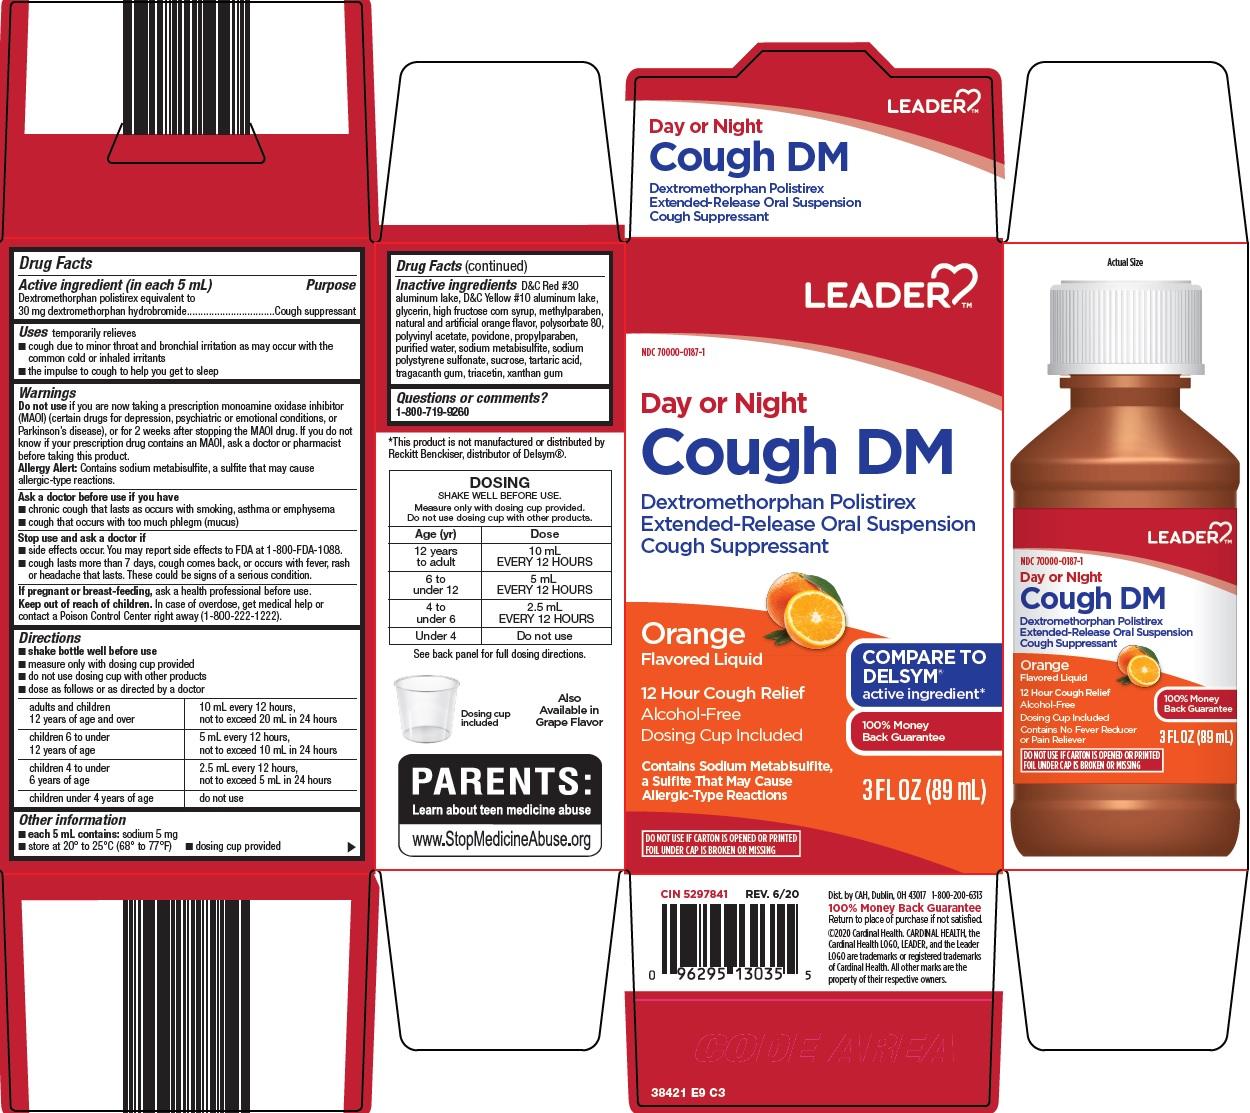 dextromethorphan polistirex (Leader Cough DM)